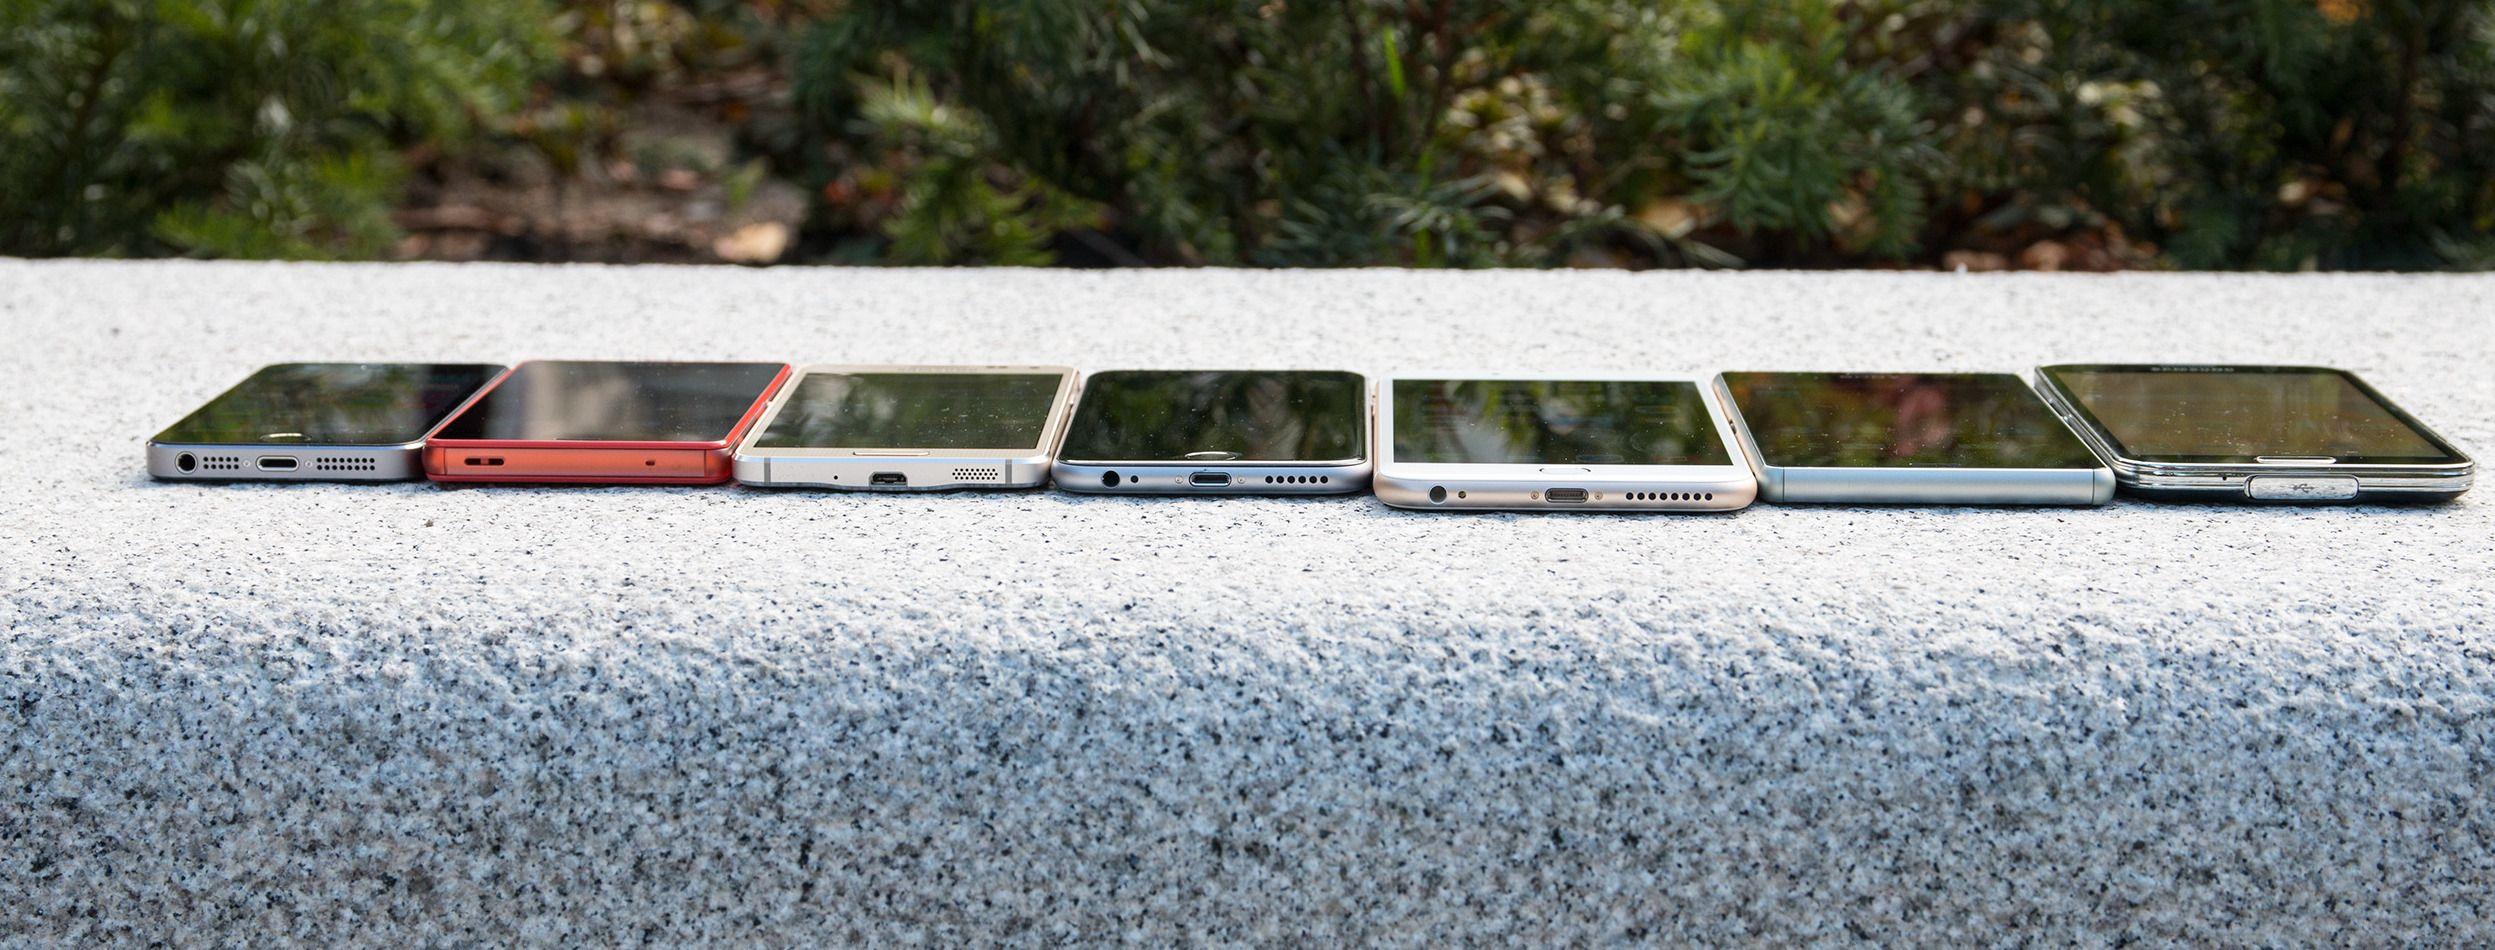 Fra venstre: Apple iPhone 5S, Sony Xperia Z3 Compact, Samsung Galaxy Alpha, Apple iPhone 6, Apple iPhone 6 Plus, Sony Xperia Z3 og Samsung Galaxy S5.Foto: Jørgen Elton Nilsen, Tek.no